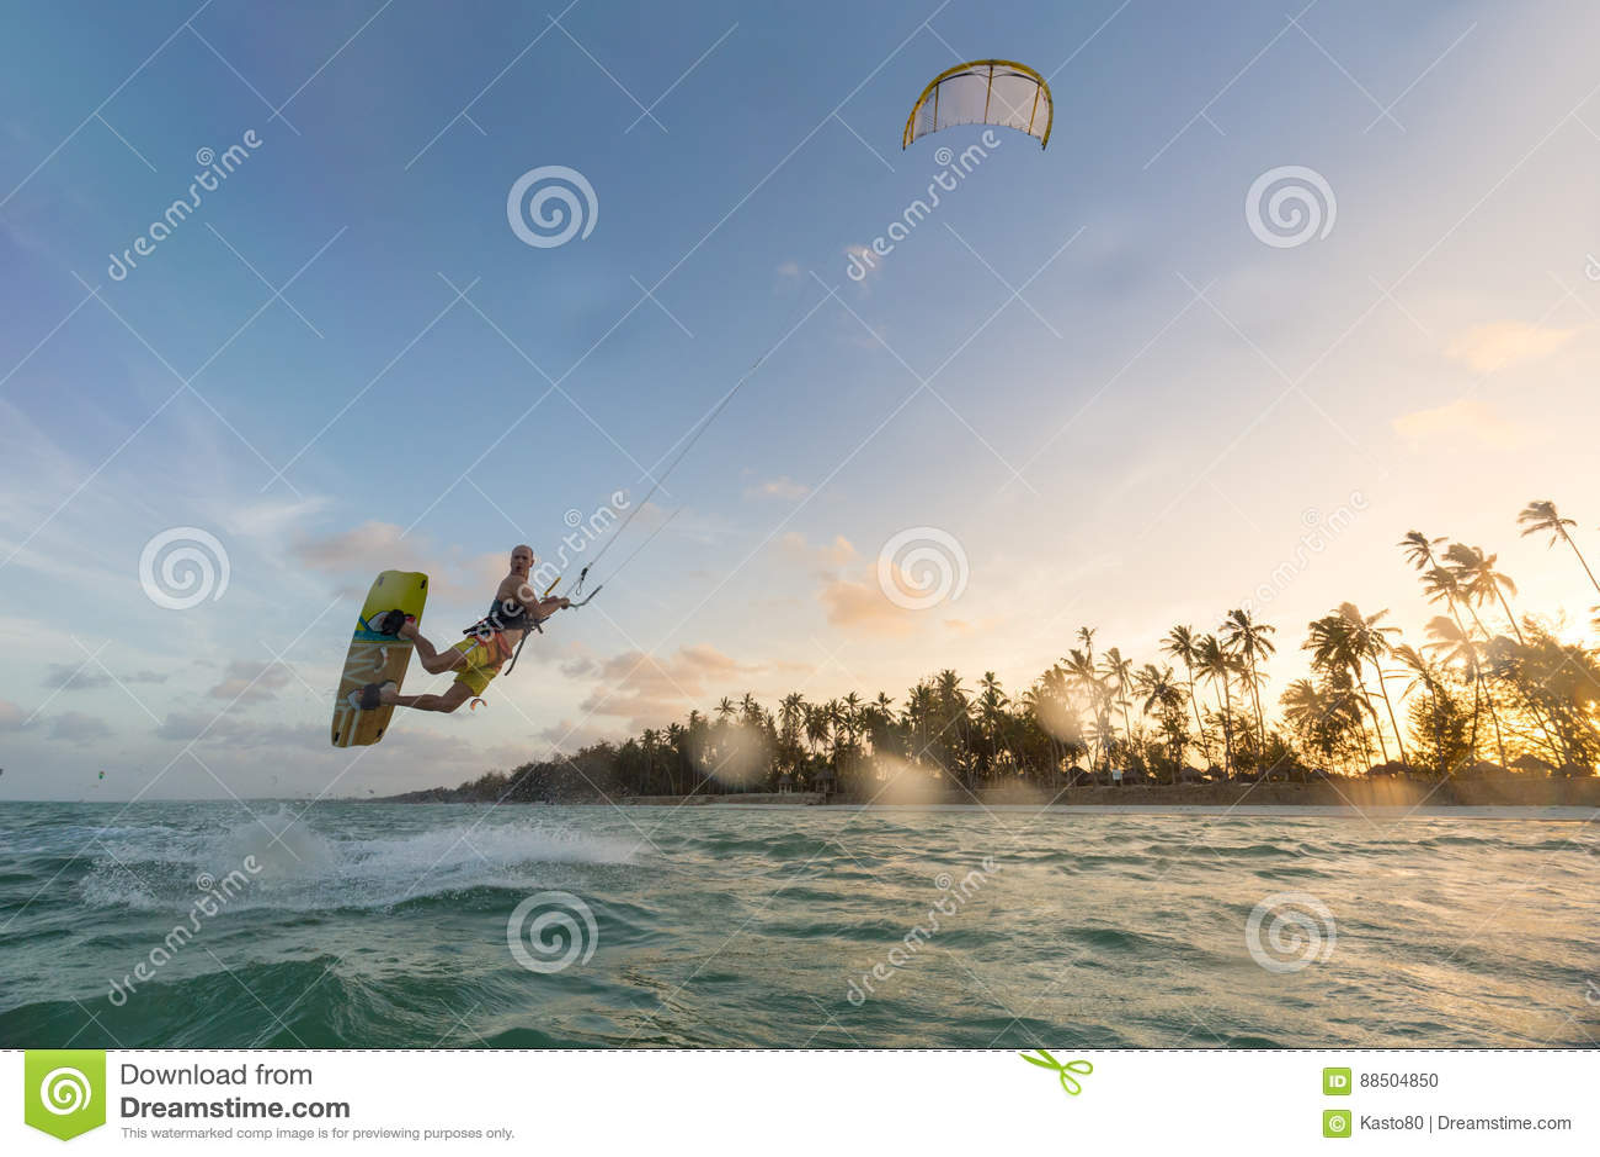 Kiteboarding Διασκέδαση στον ωκεανό Ακραίος αθλητισμός Kitesurfing